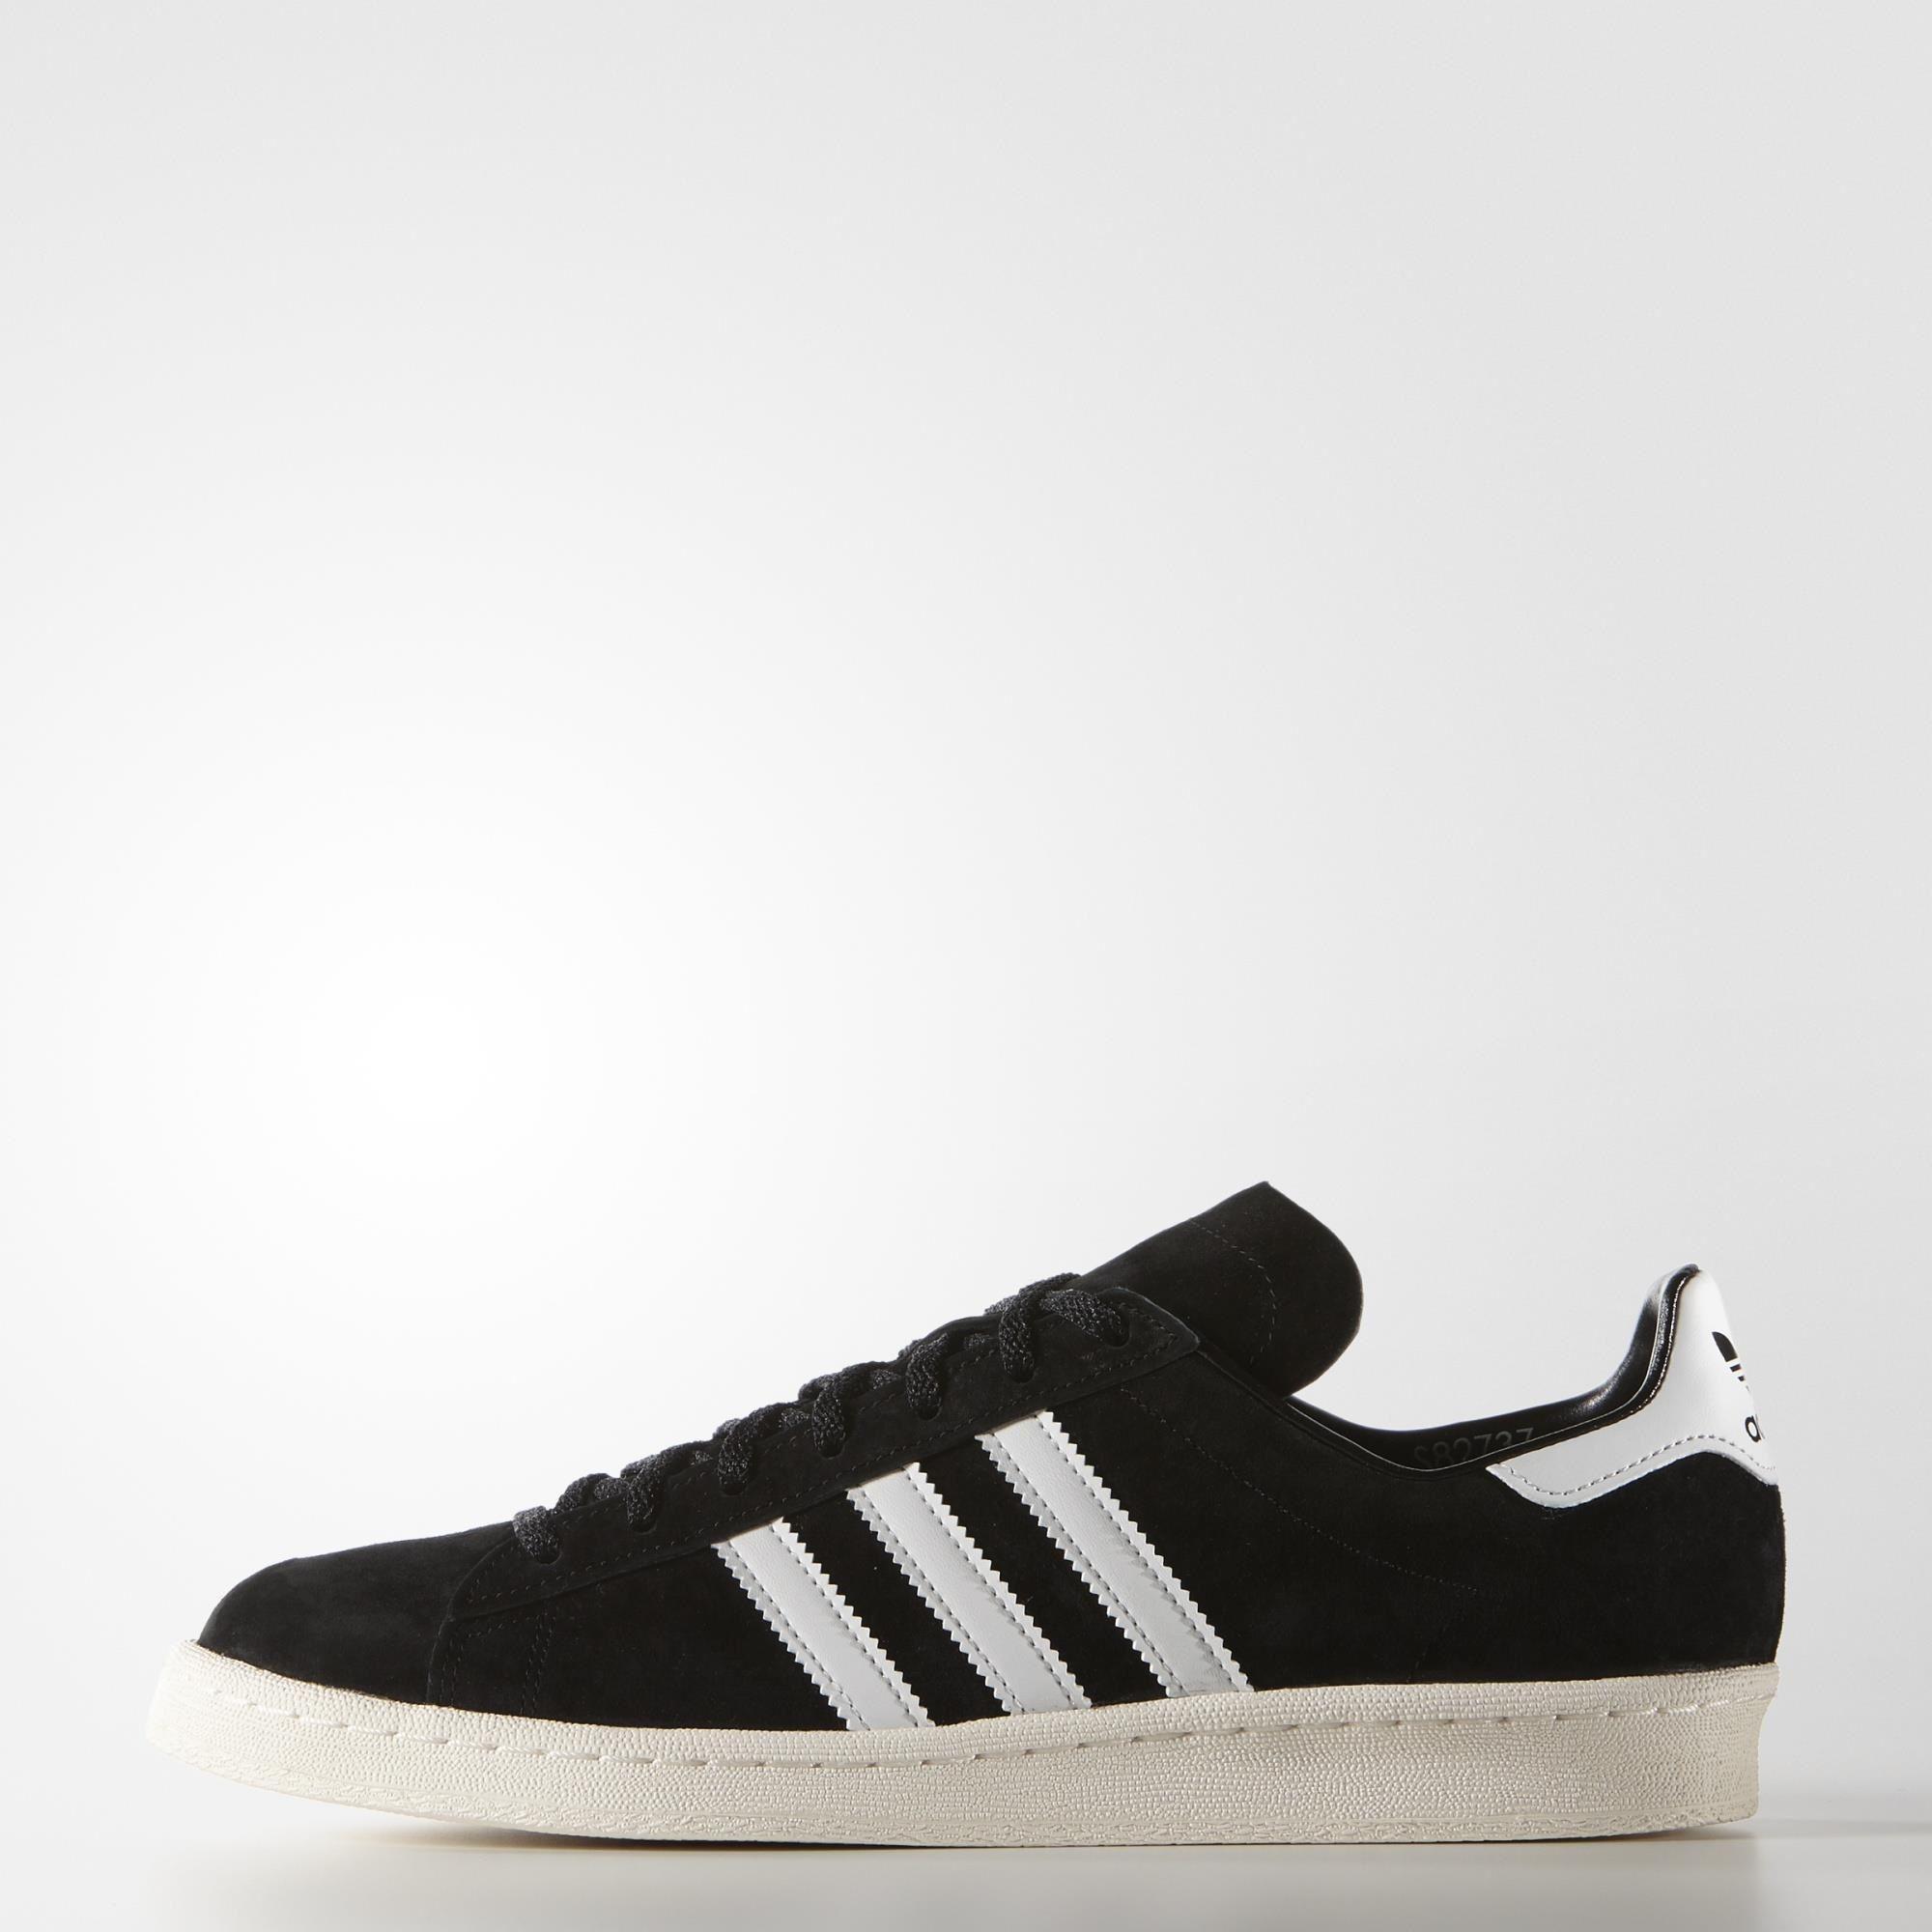 adidas US. Adidas Campus ShoesVintage ...